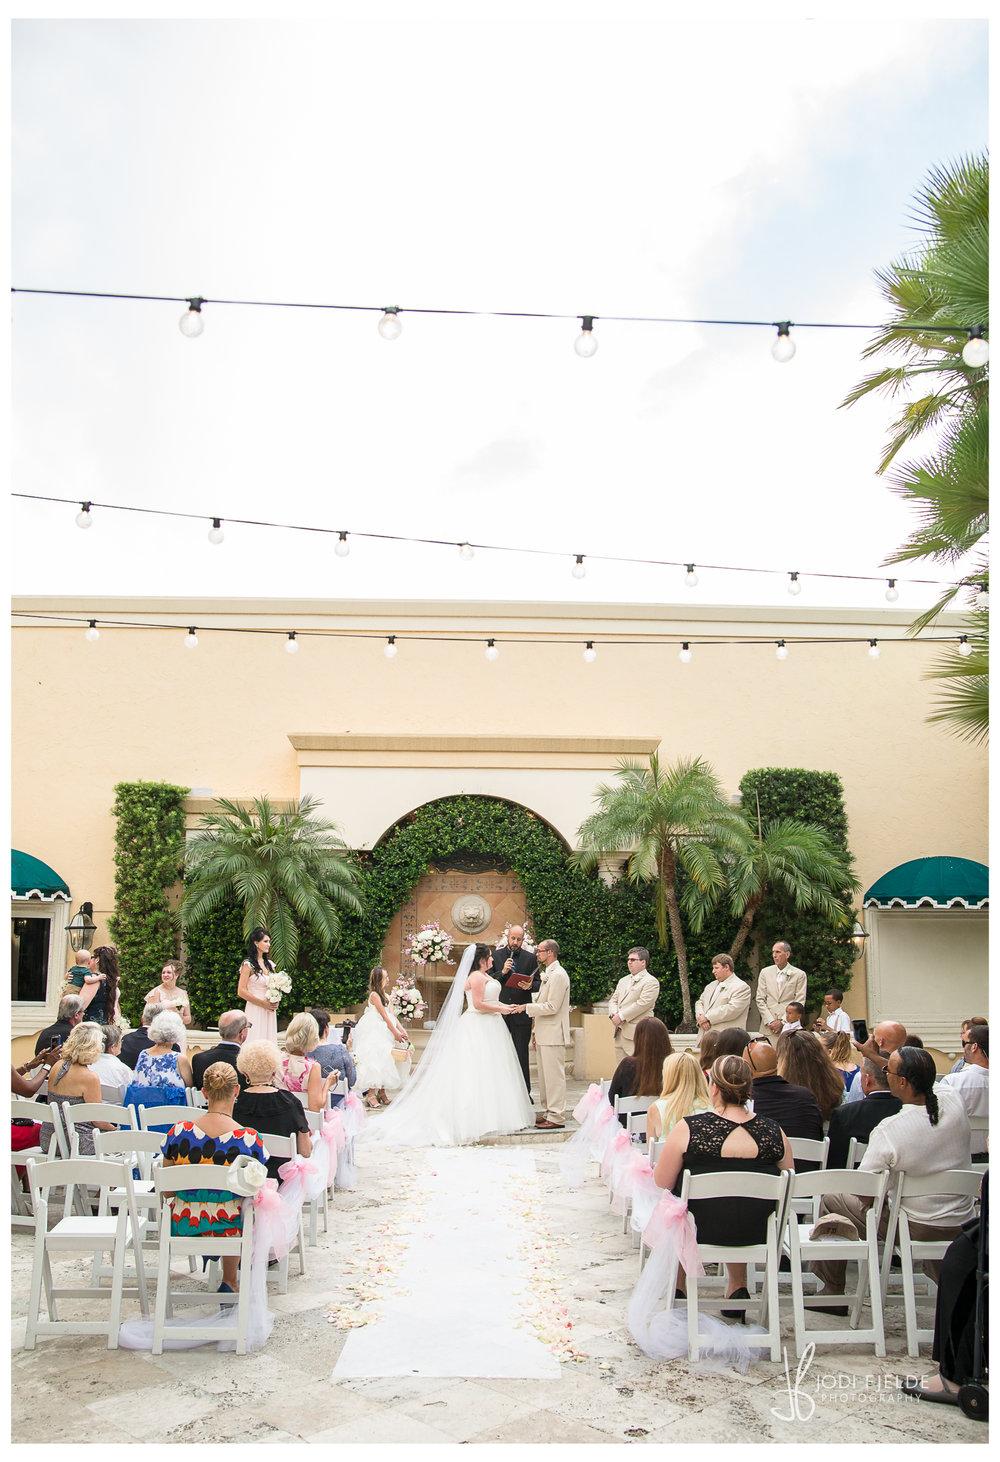 Benvenuto_Boynton Beach_ Wedding_Emily_&_Shawn 19.jpg